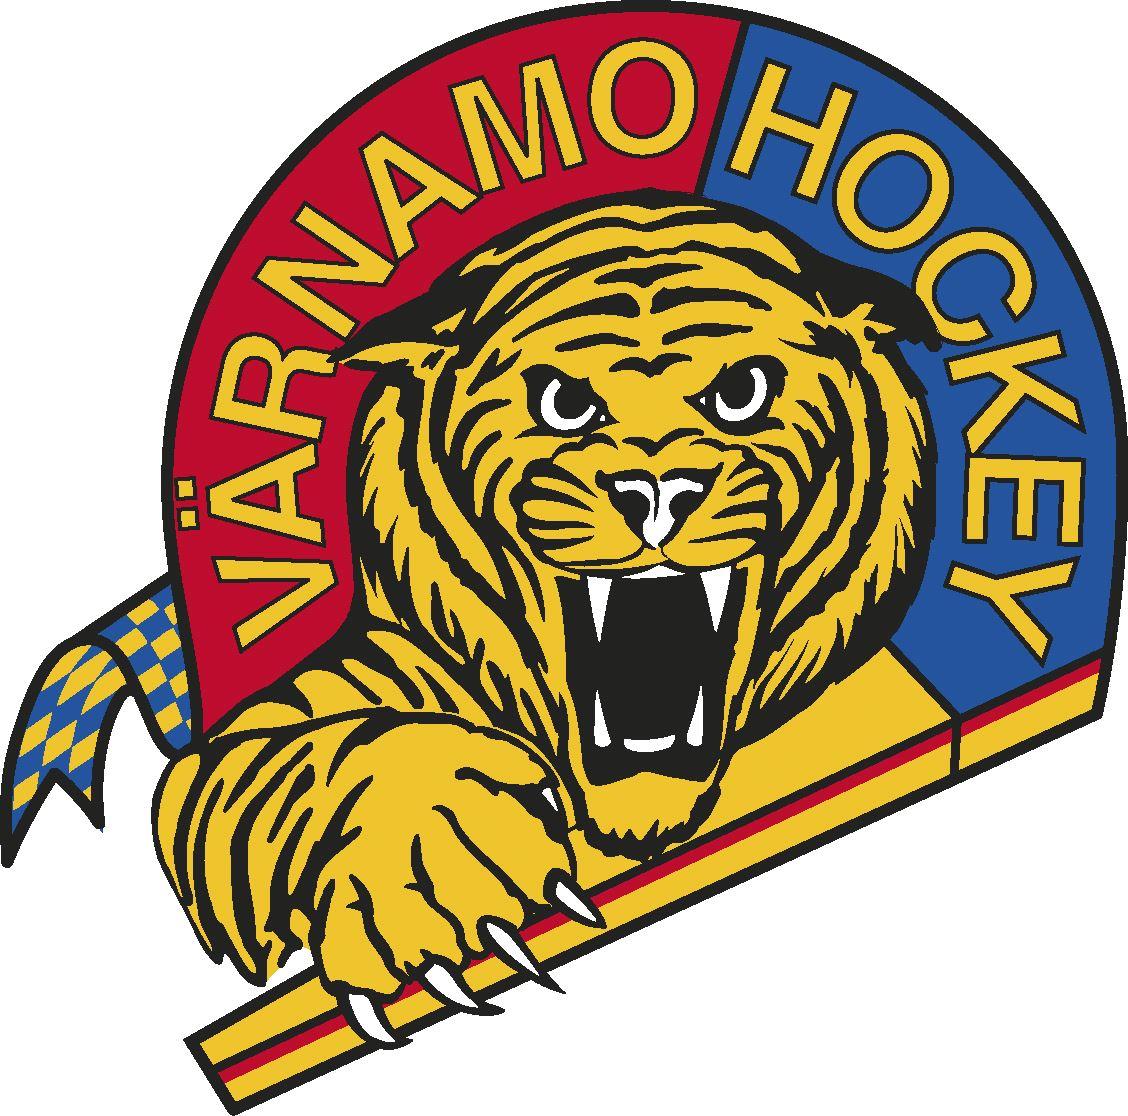 Värnamo Hockey - Mörrum GoIS